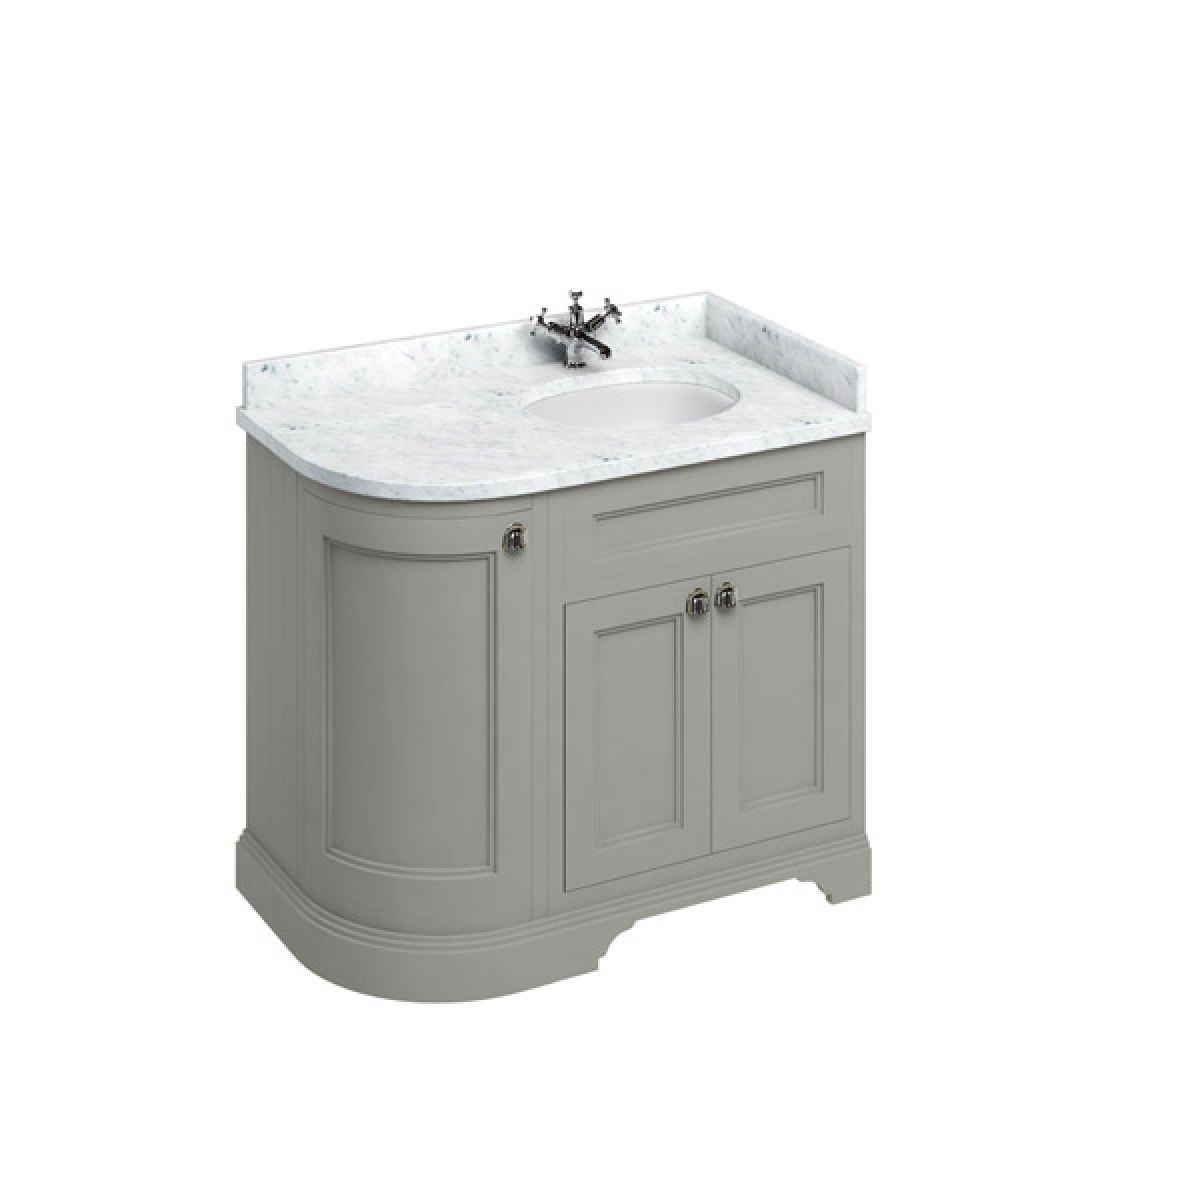 Burlington Dark Olive Freestanding Right End Round Vanity Unit 980mm Carrara White